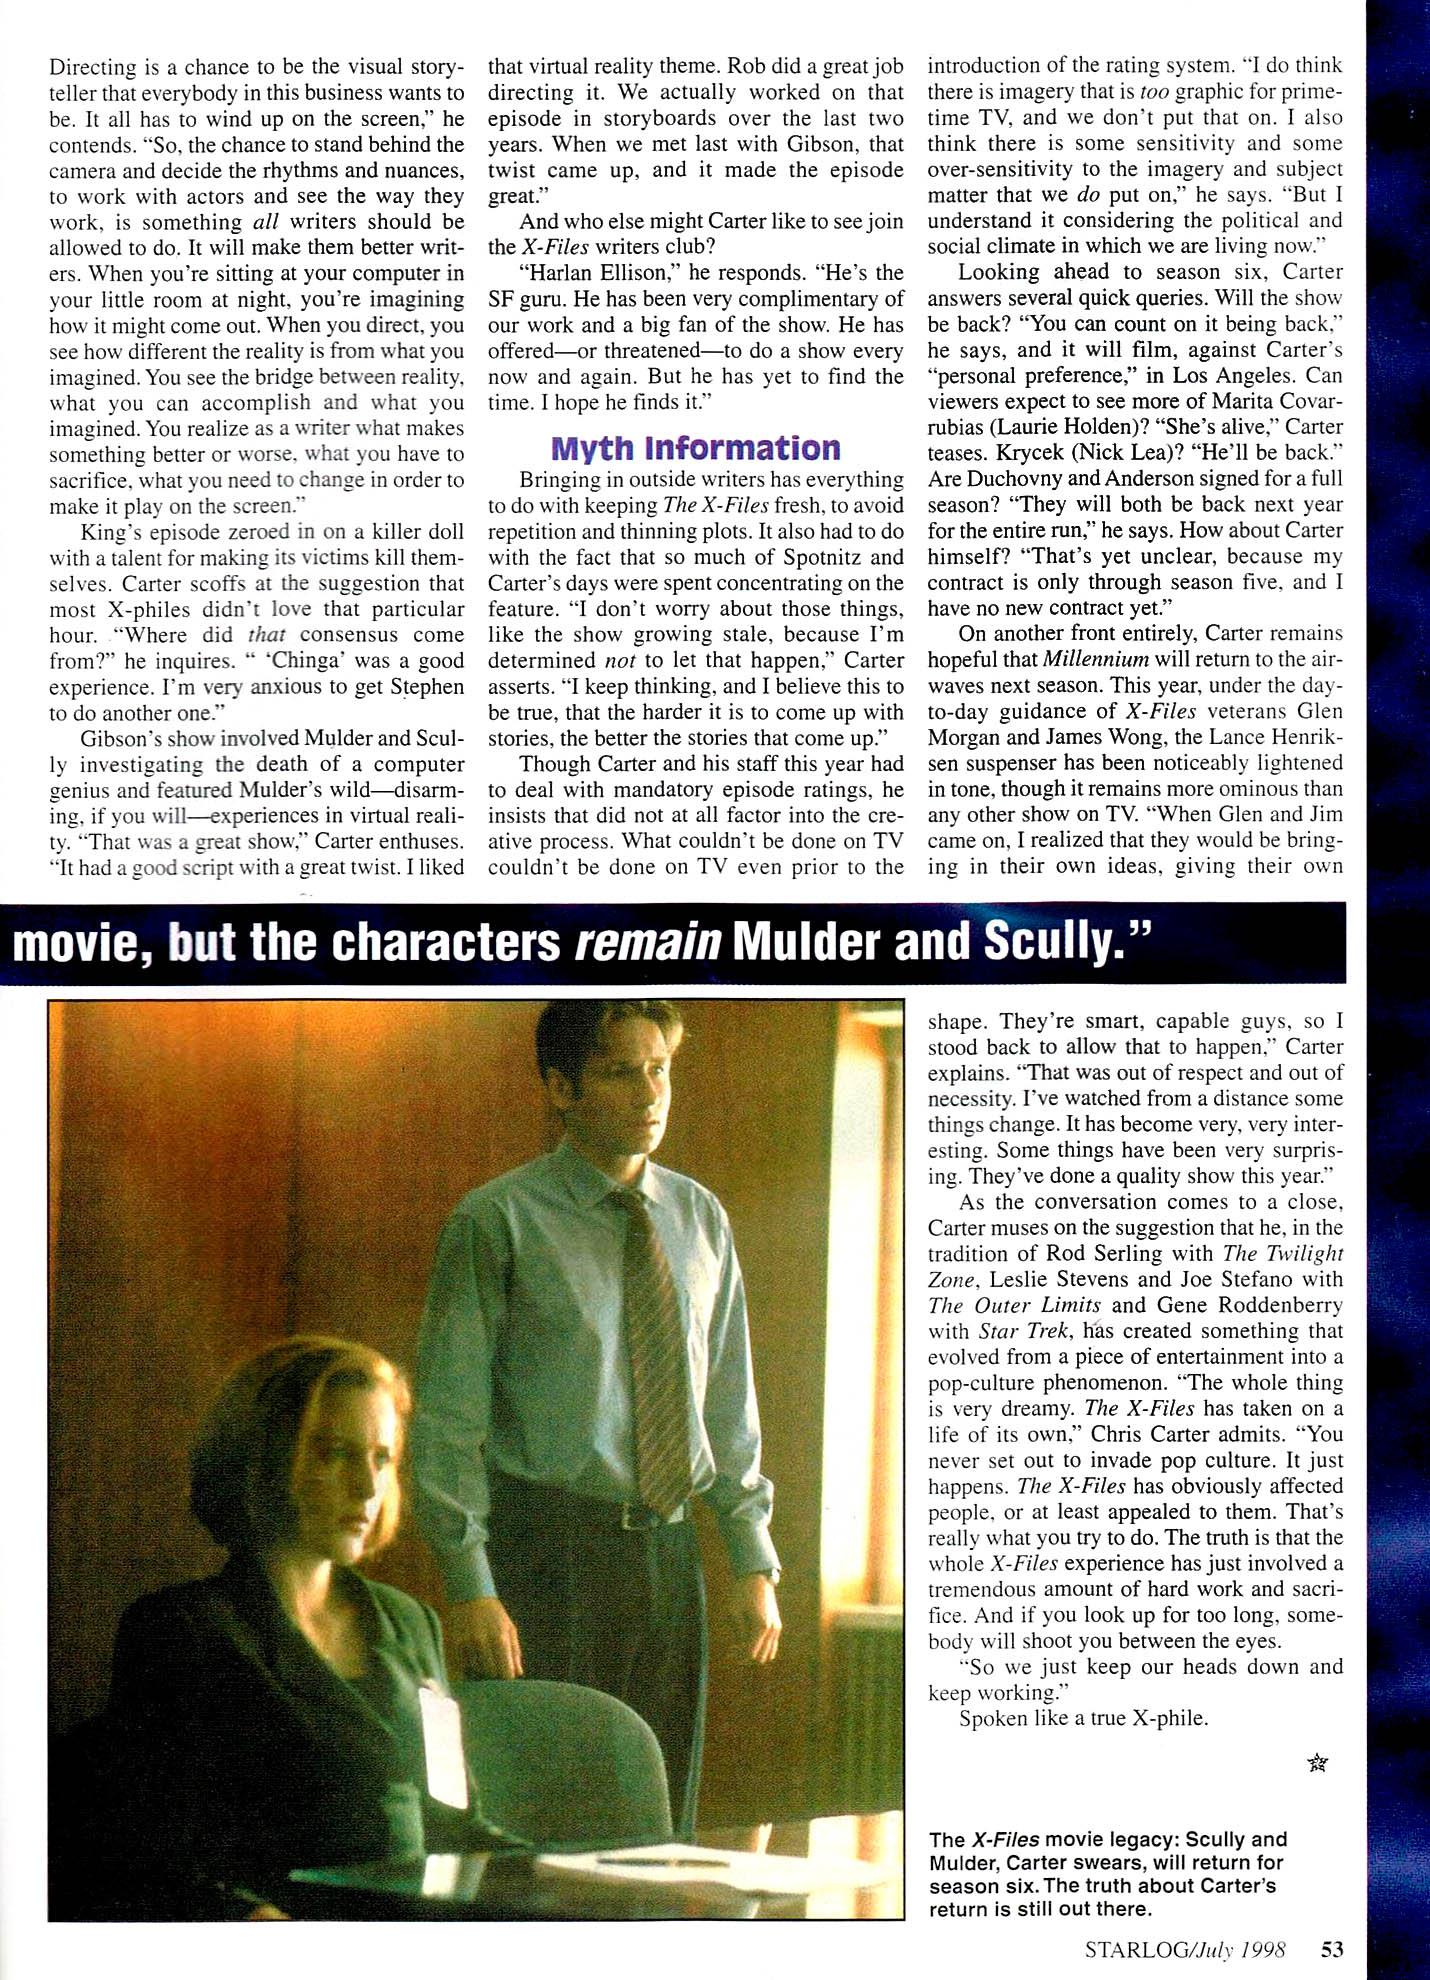 Starlog 252 1998 07 X-Files-8.jpg